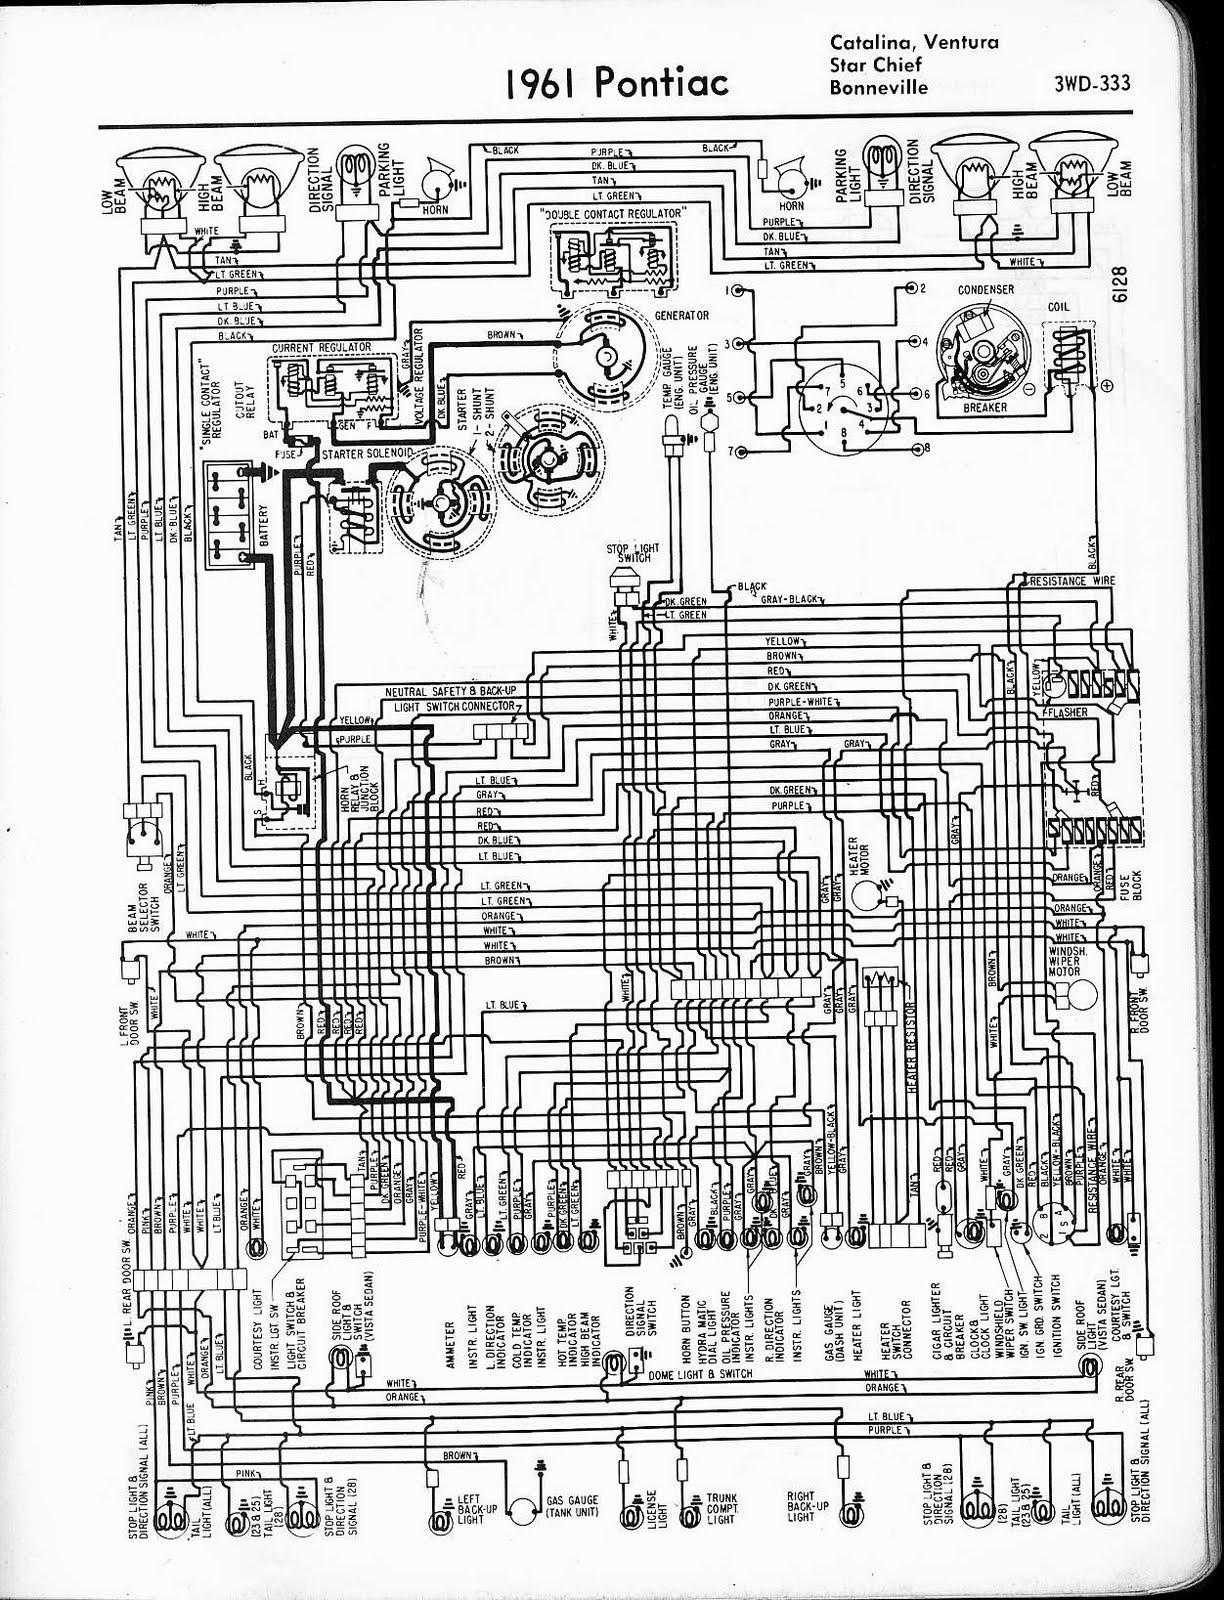 Free Auto Wiring Diagram  1961 Pontiac Catalina  Ventura  Star Chief  And Bonneville Wiring Diagram